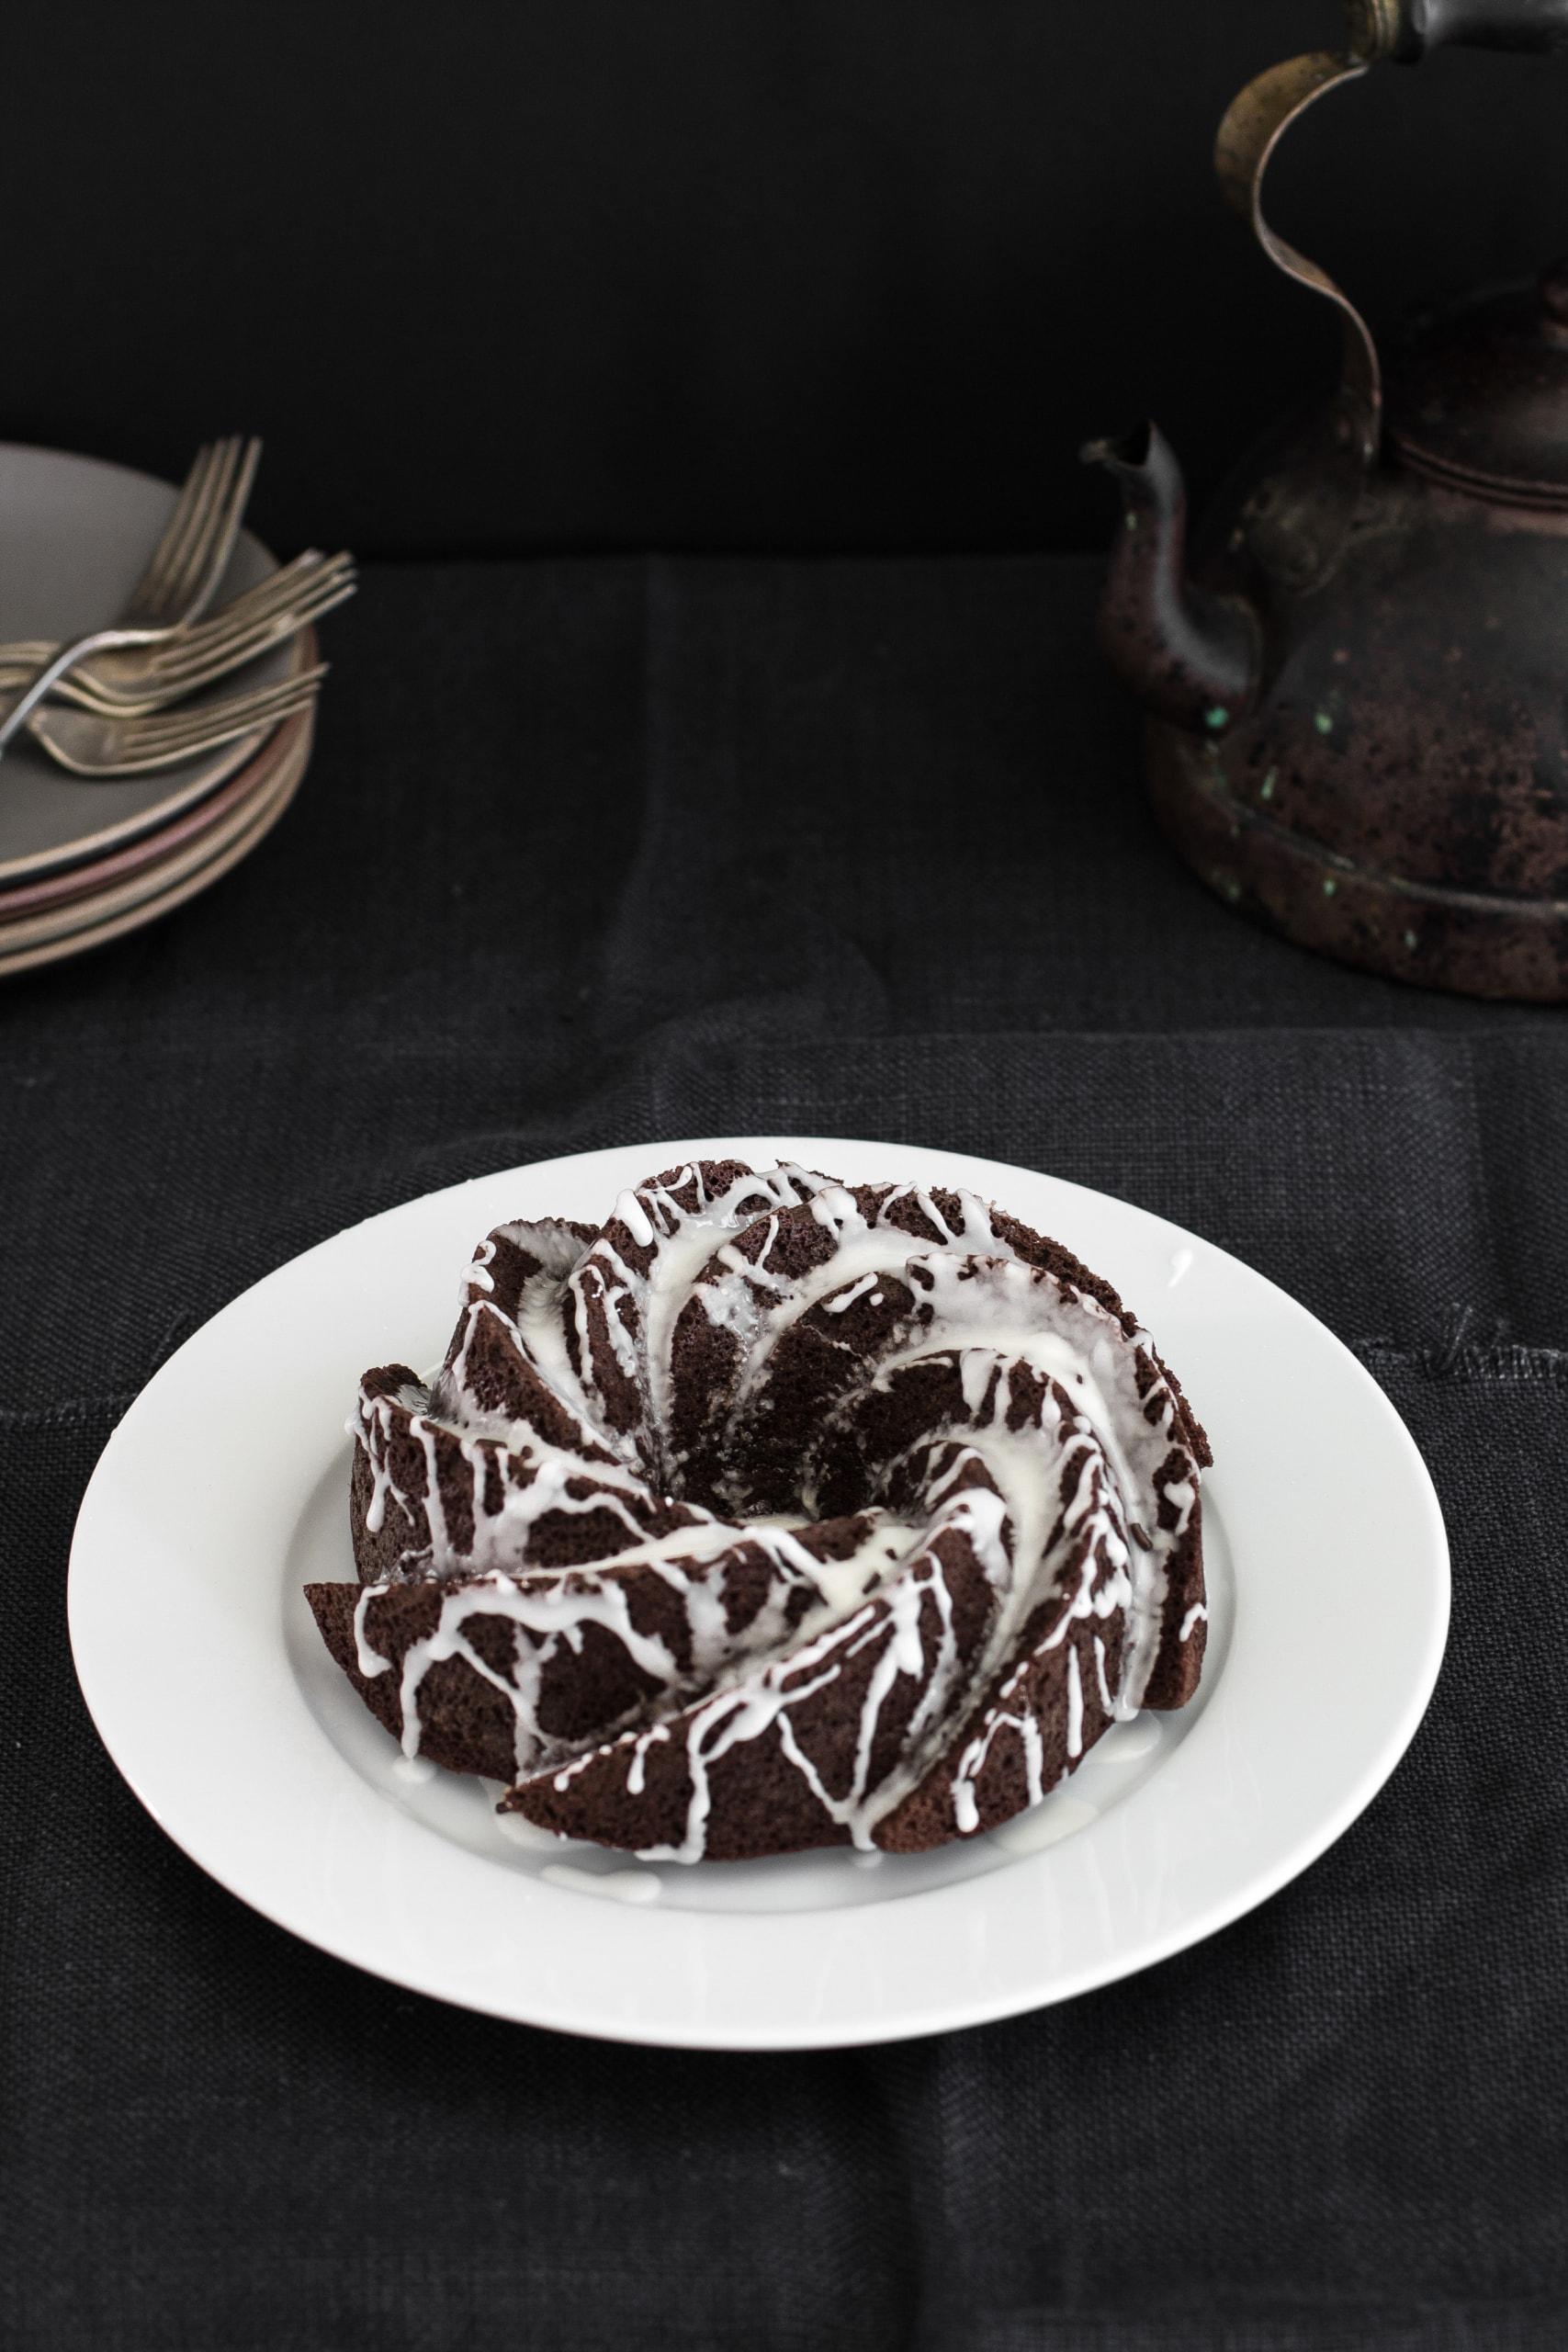 Chocolate Banana Paleo Cake on a plate, drizzled with lemon glaze- from verygoodcook.com